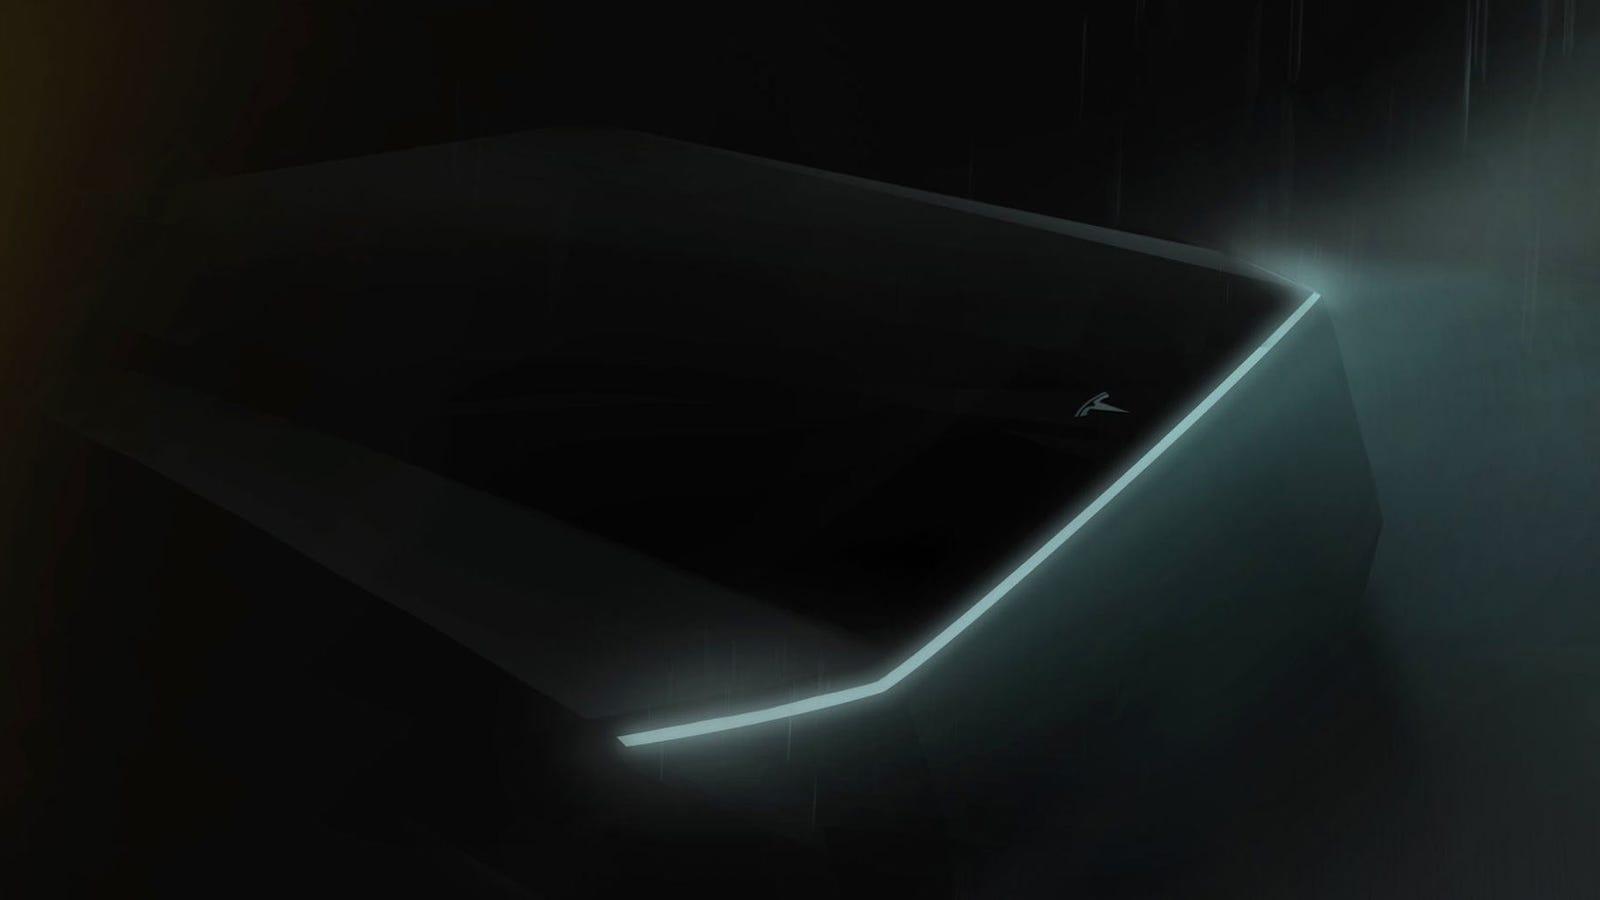 Elon Musk Snuck A Teaser Of The Tesla Truck Into The Model Y - jp npa roblox